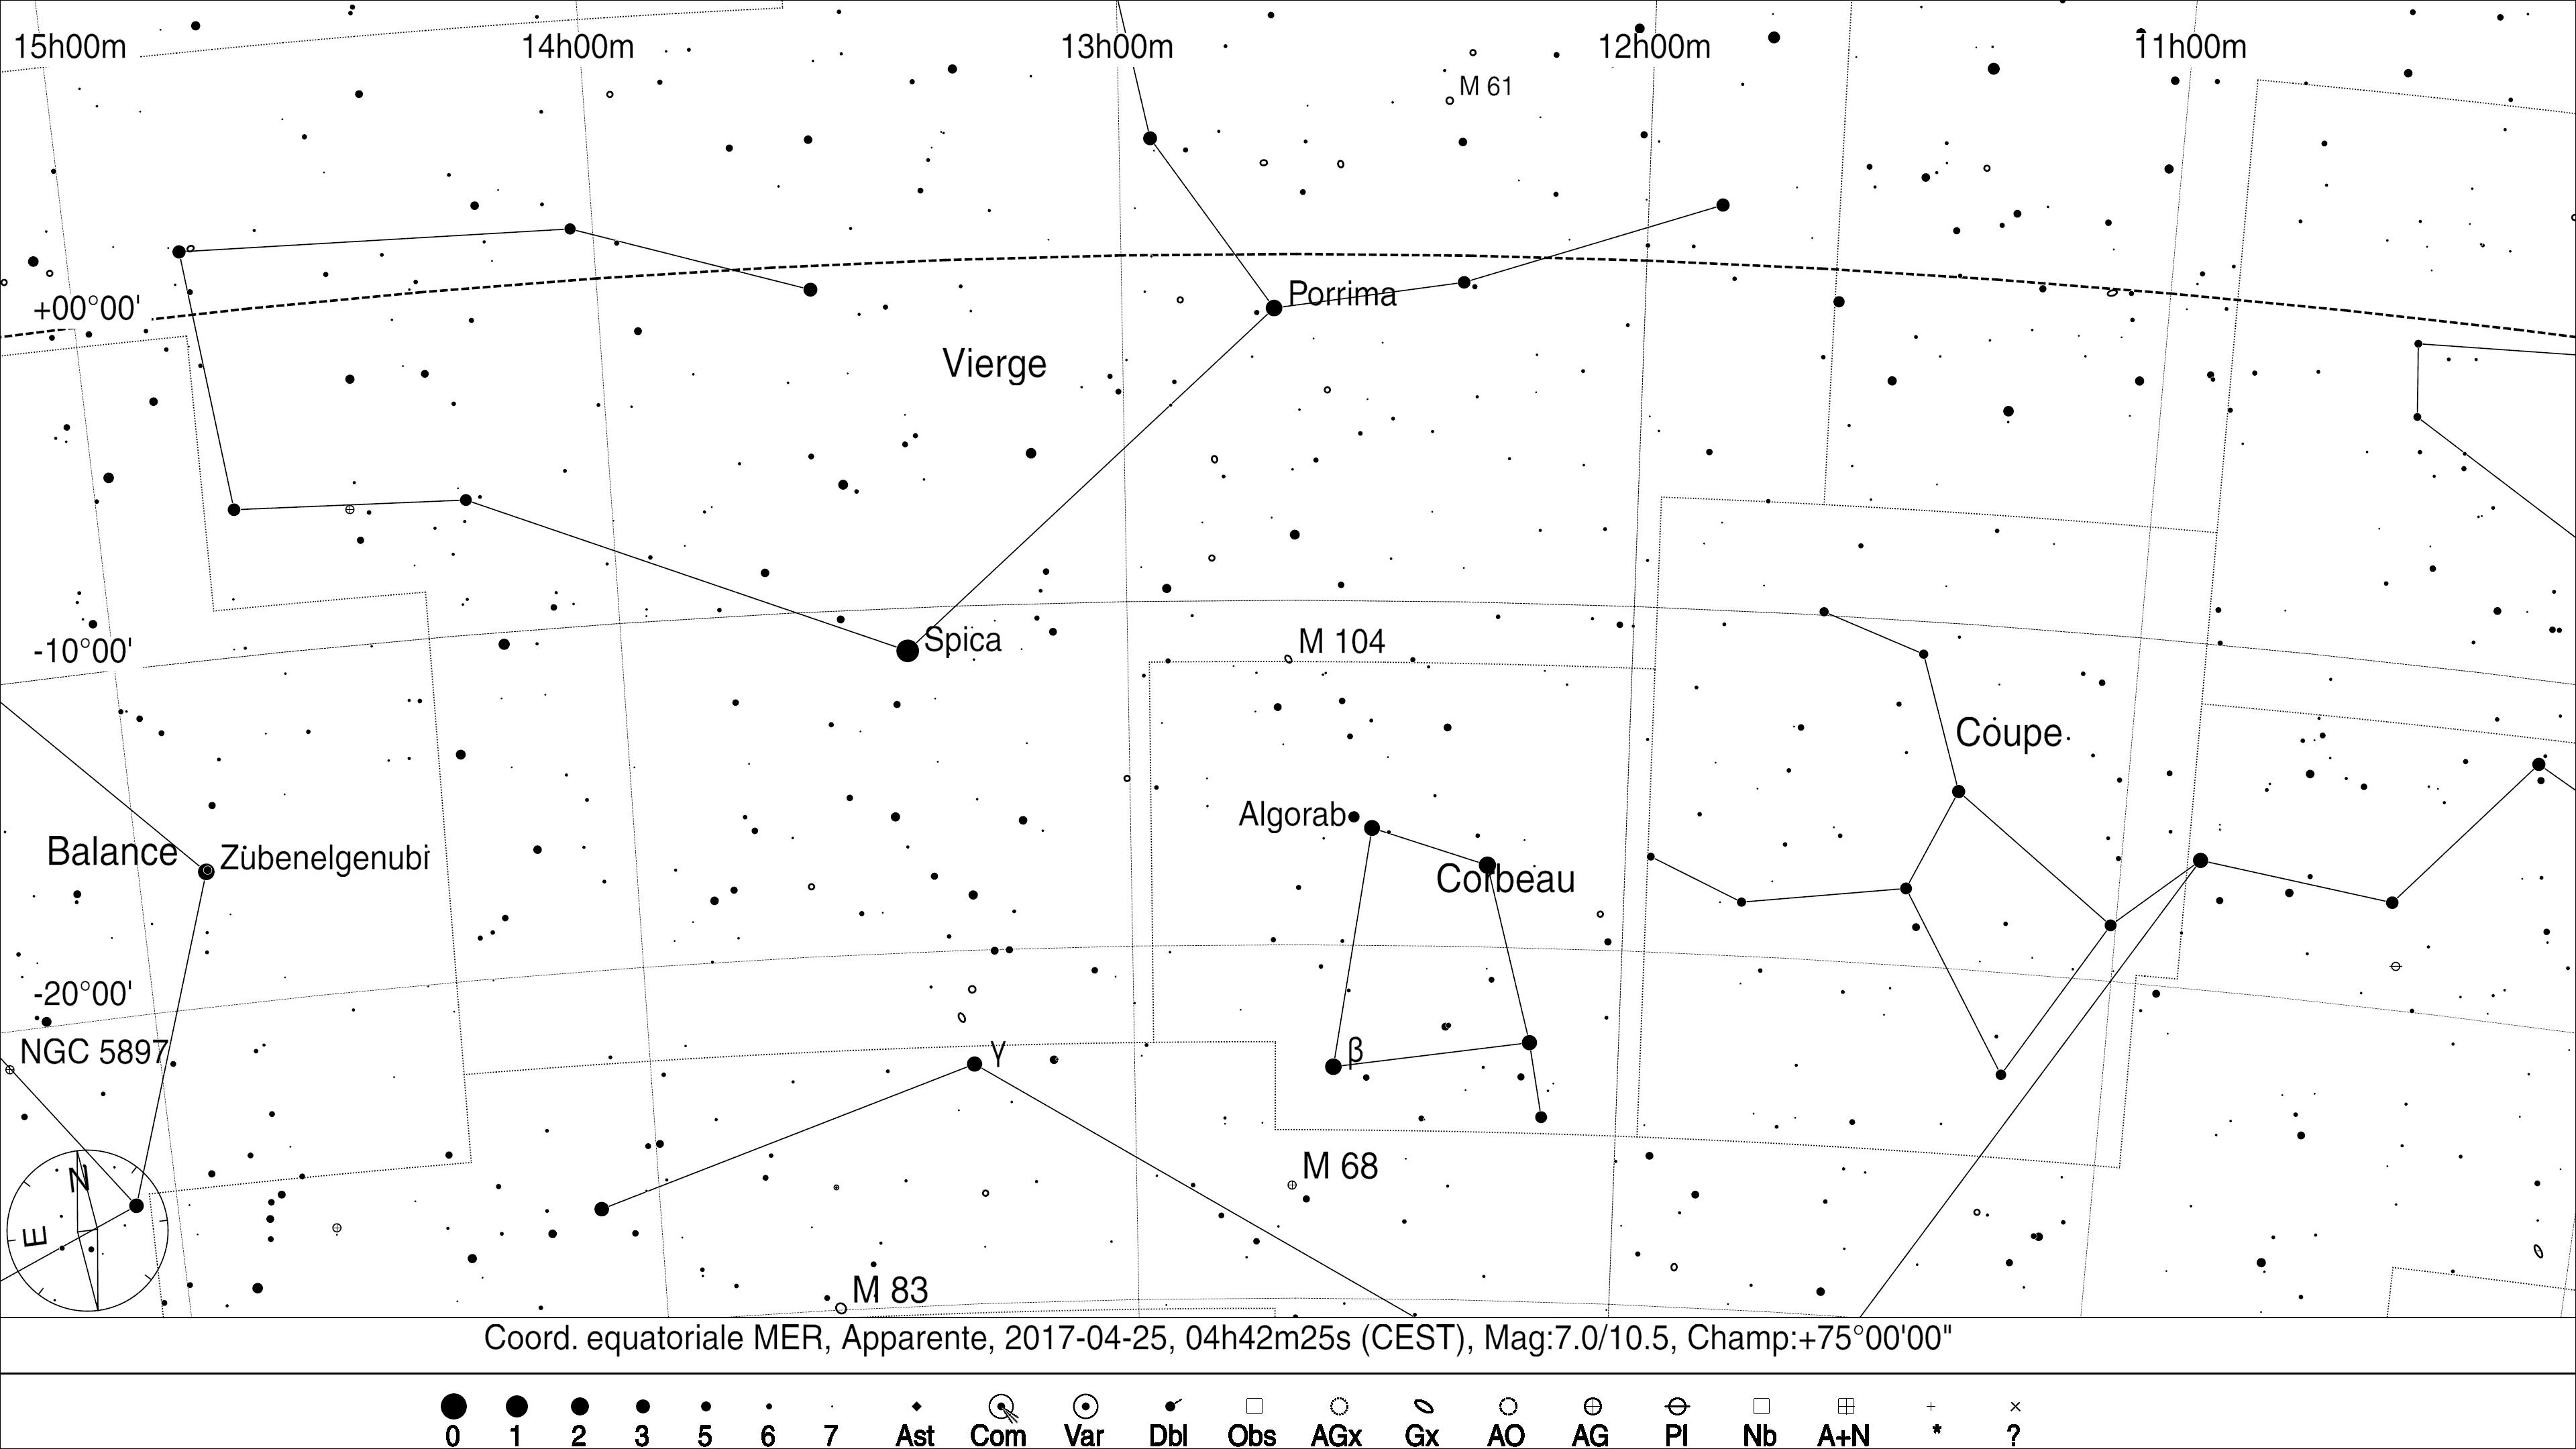 M104_75